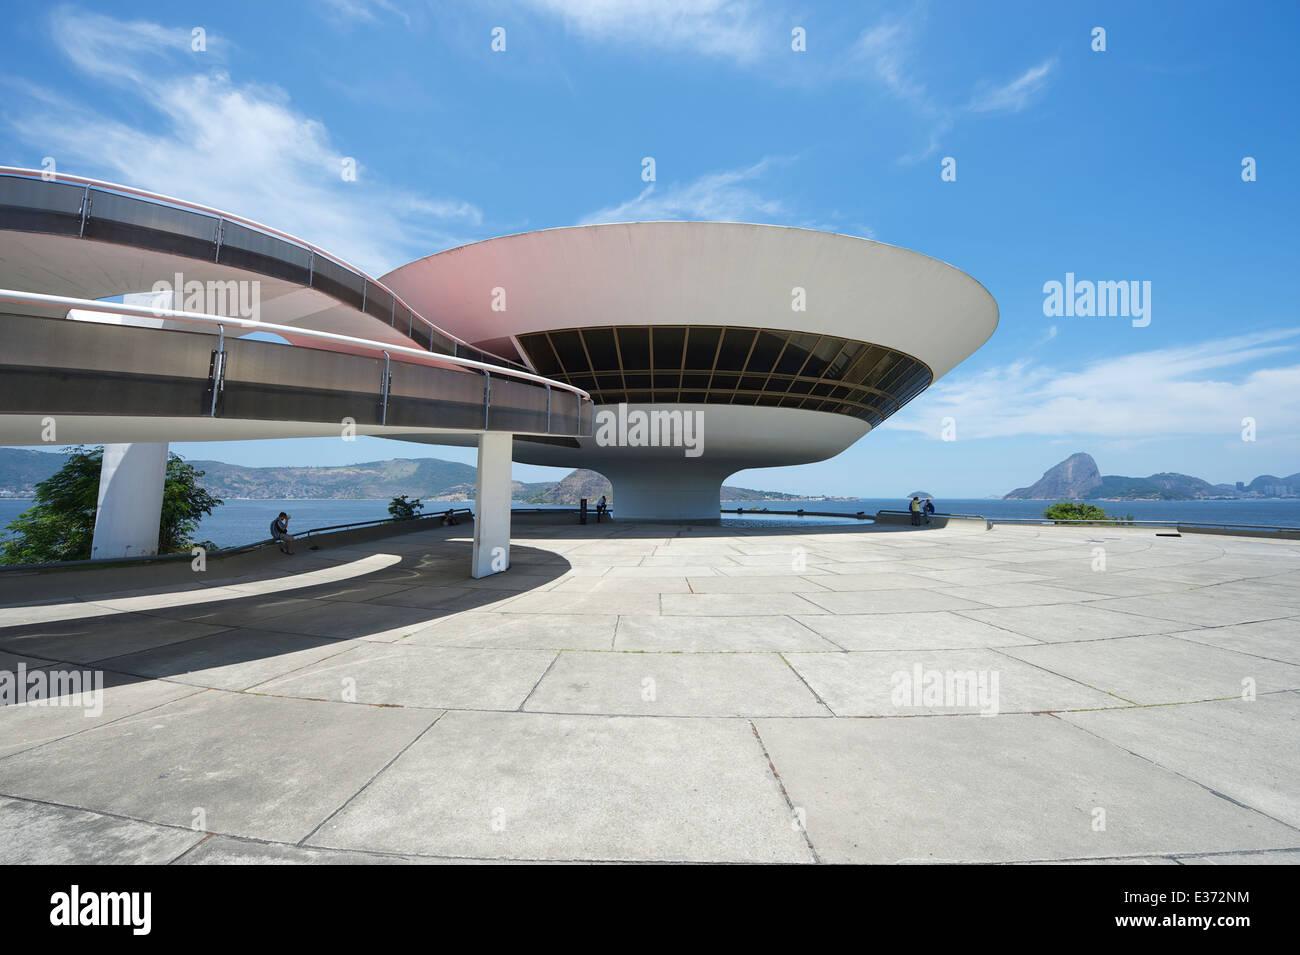 Río de Janeiro, Brasil - Febrero 4, 2014: El modernista Niteroi, Museo de Arte Contemporáneo (MAC) por Imagen De Stock